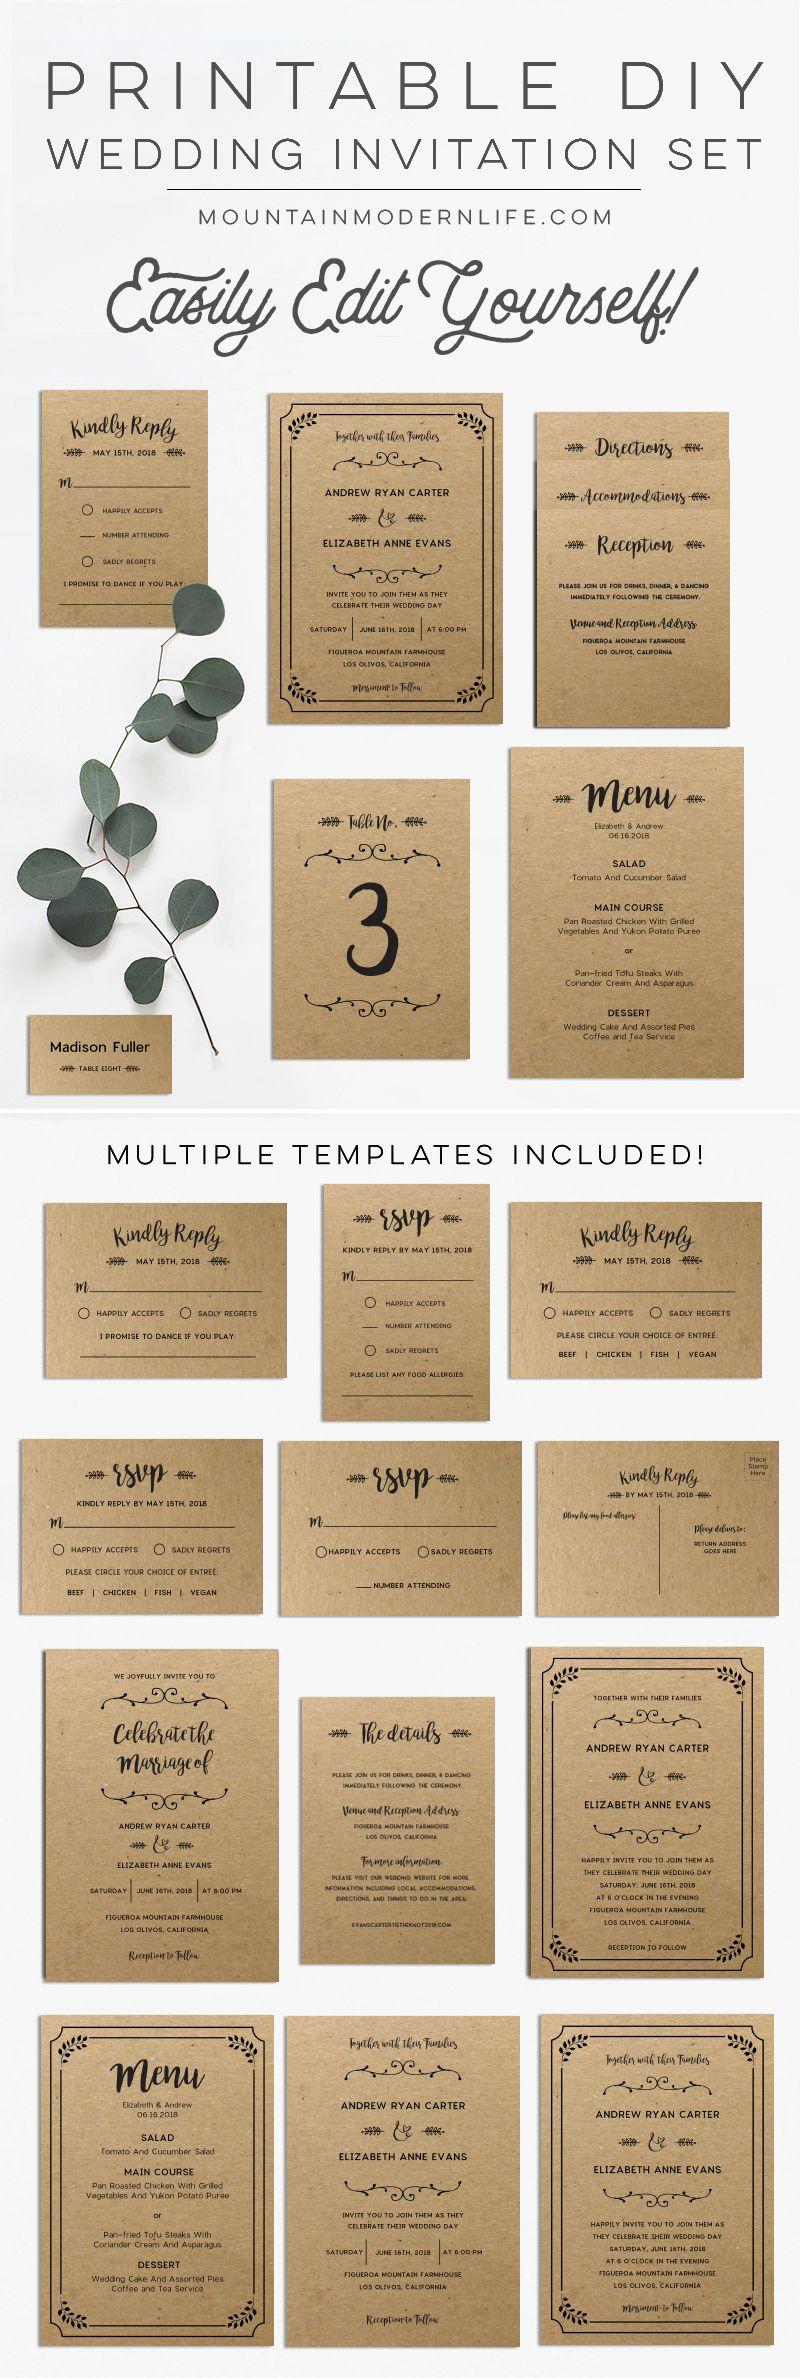 Whimsical rustic diy wedding invitation set wedding pinterest